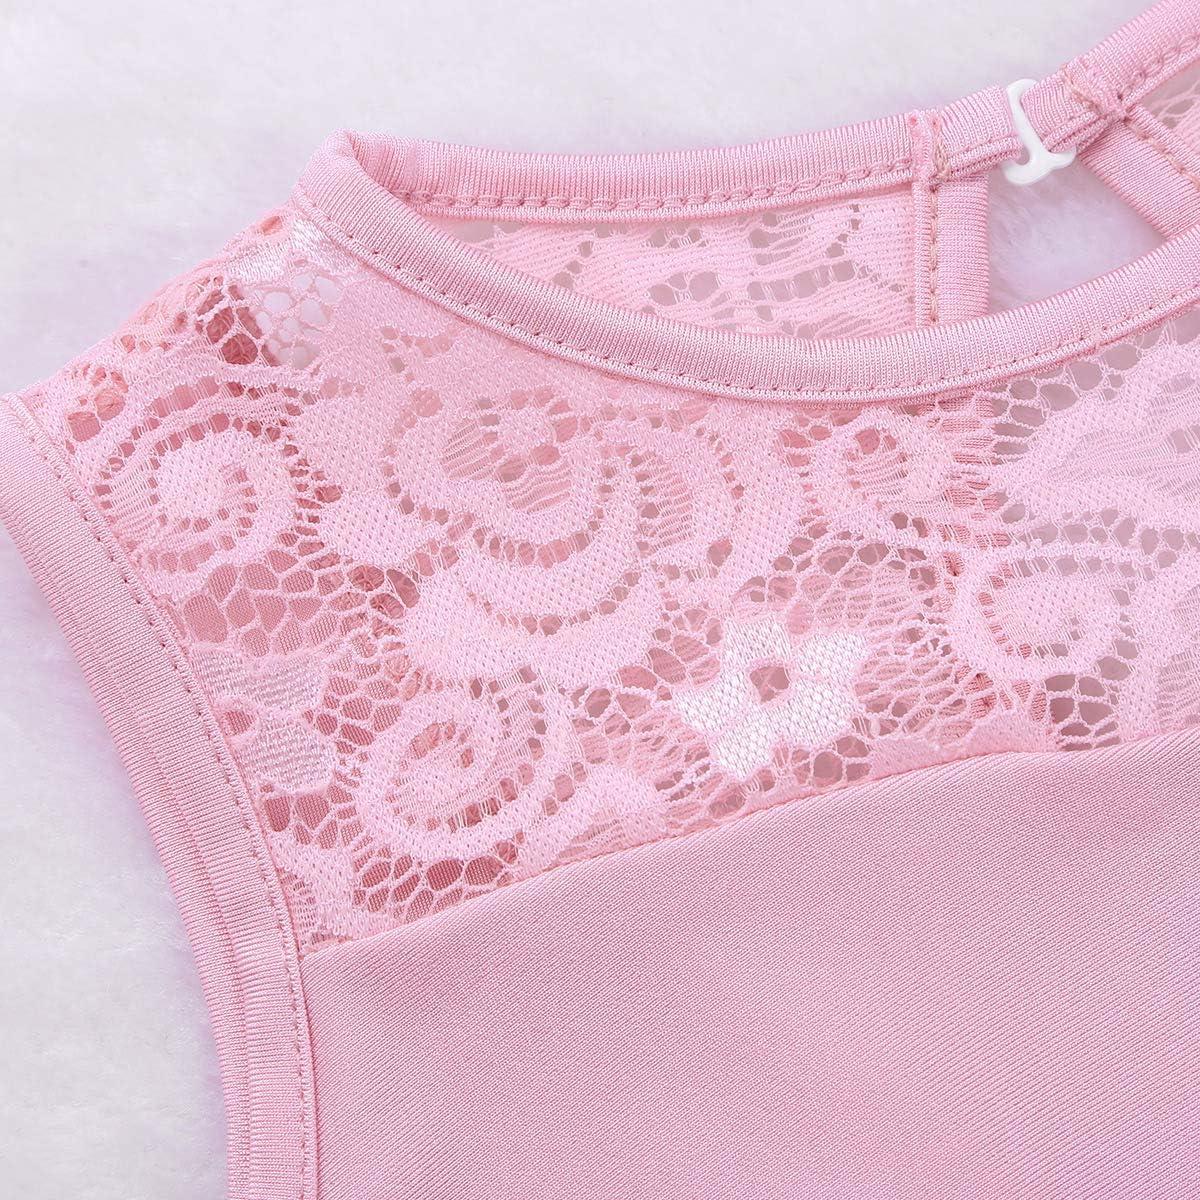 winying Girls Floral Lace Splice Cut Out Back Ballet Dance Gymnastics Leotard Jumpsuit